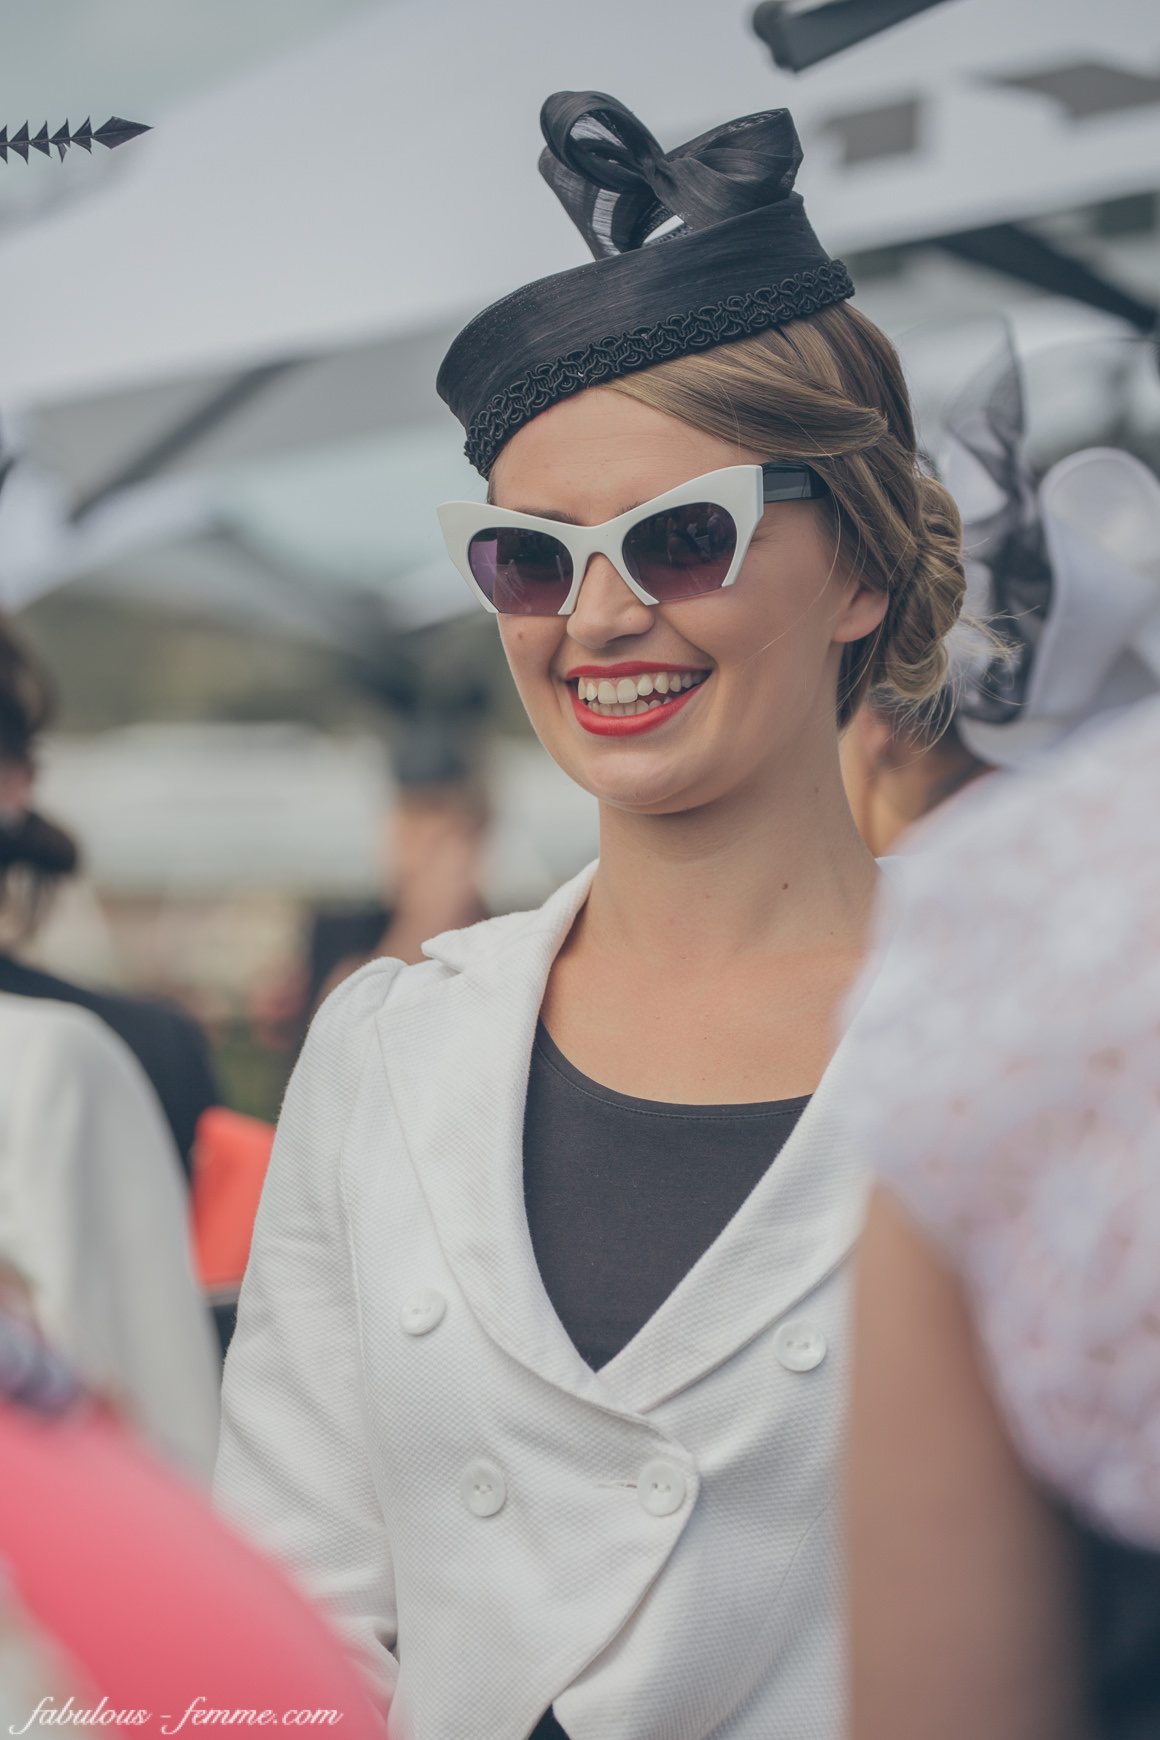 sunglasses - black and white